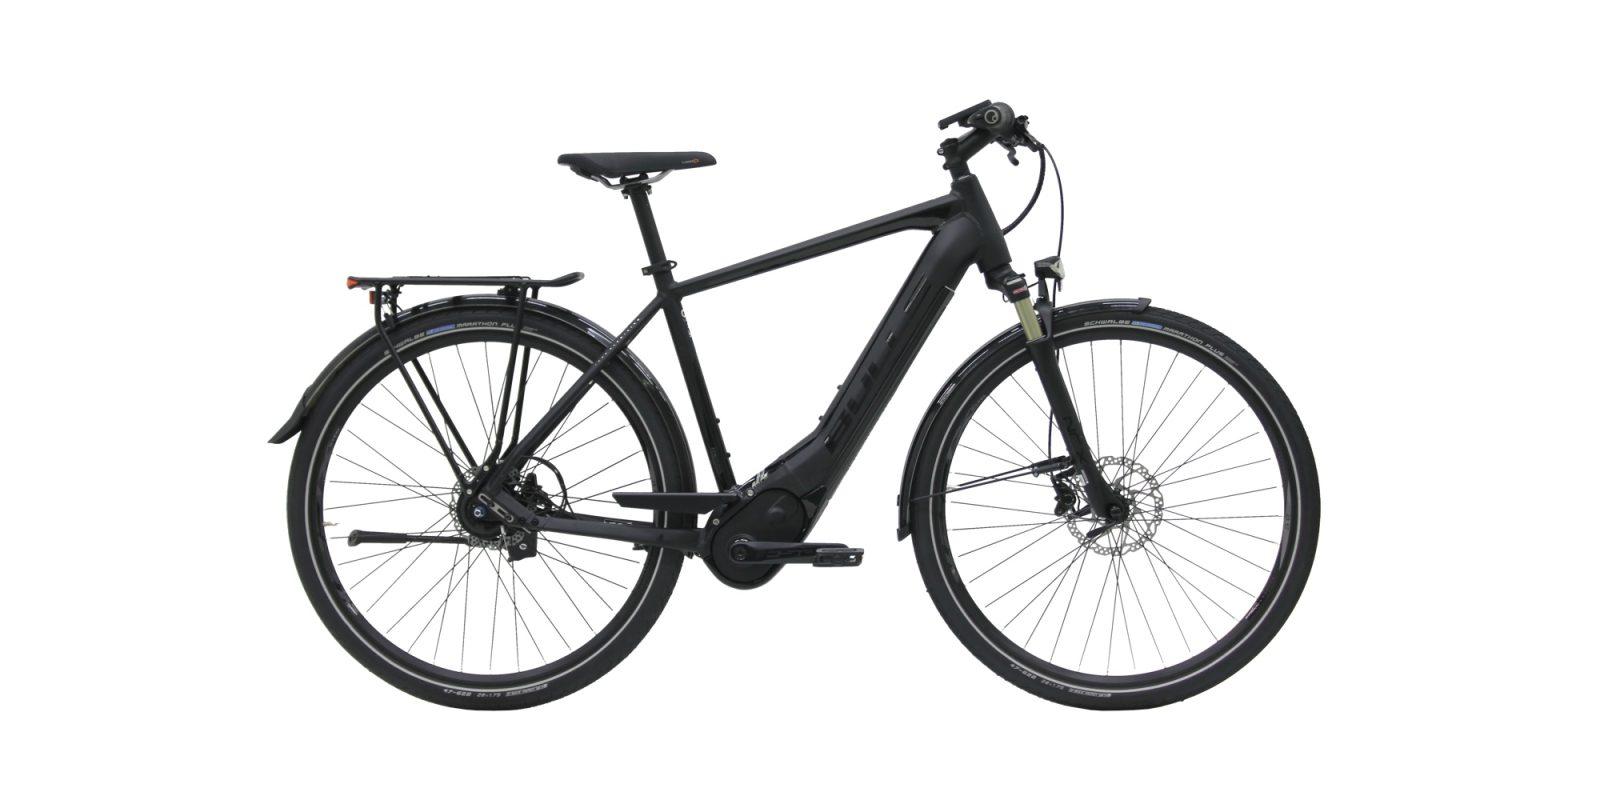 BULLS announces arrival of new 150-mile-range trekking electric bike